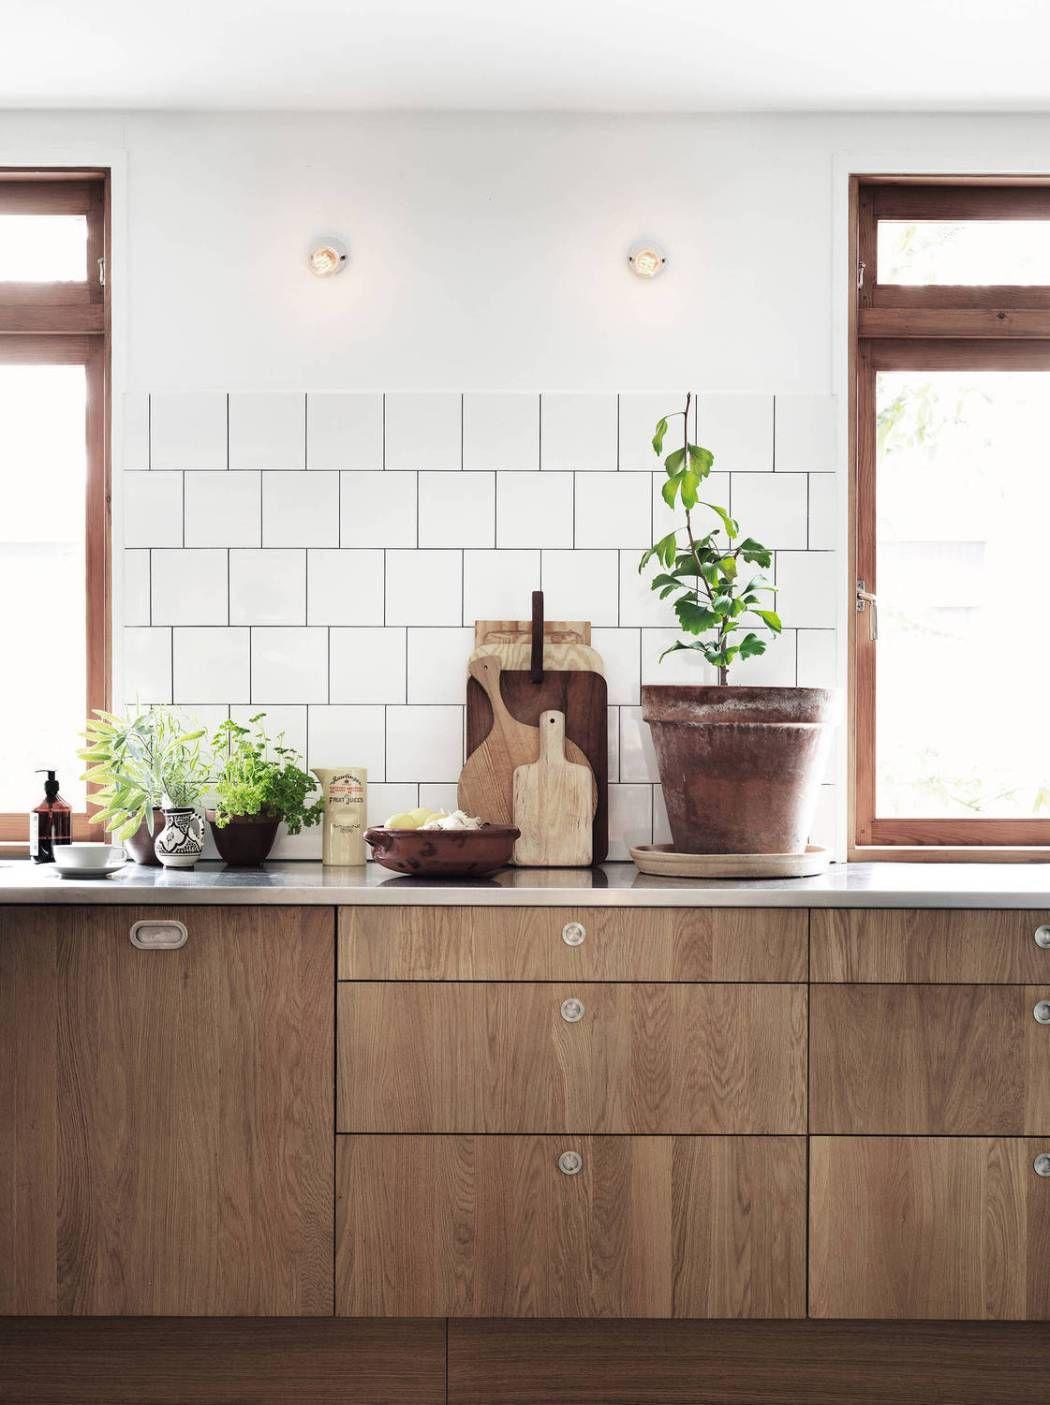 Backsplash around kitchen window  visite déco  window moldings wood colors and countertops